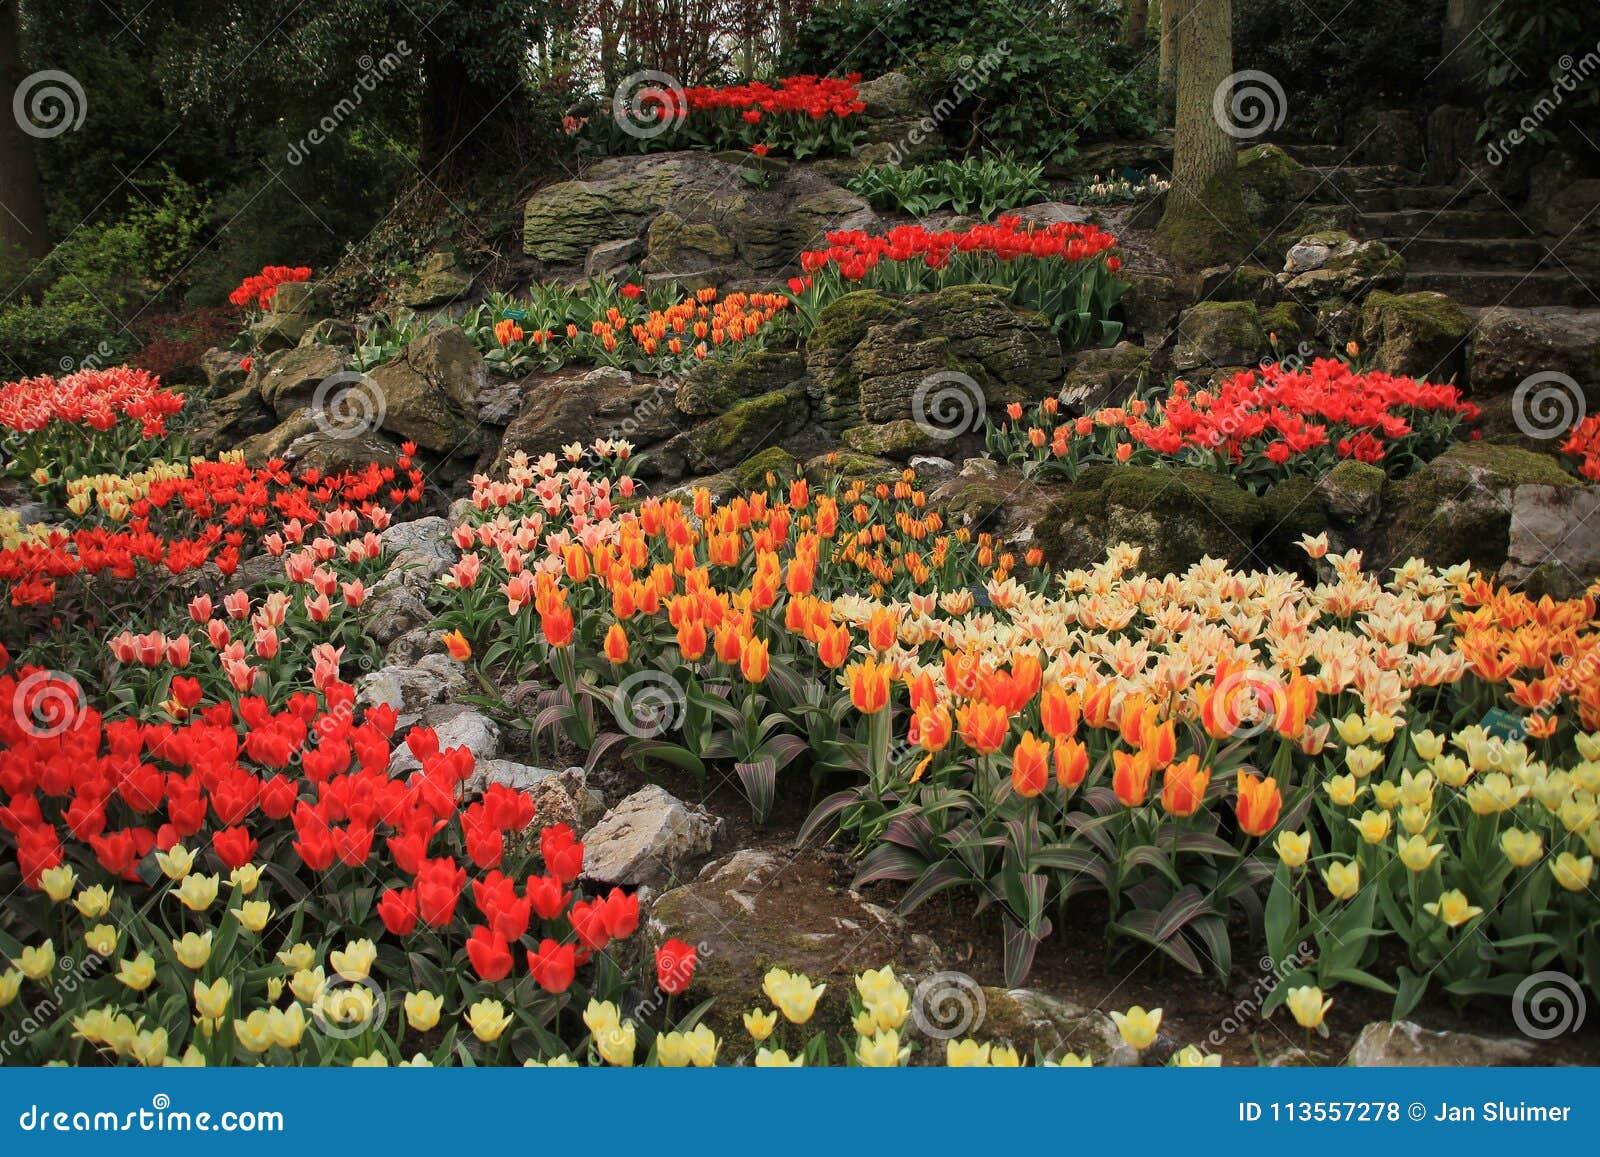 Rocks And Blooming Tulips In The Flower Garden Keukenhof In Spring ...